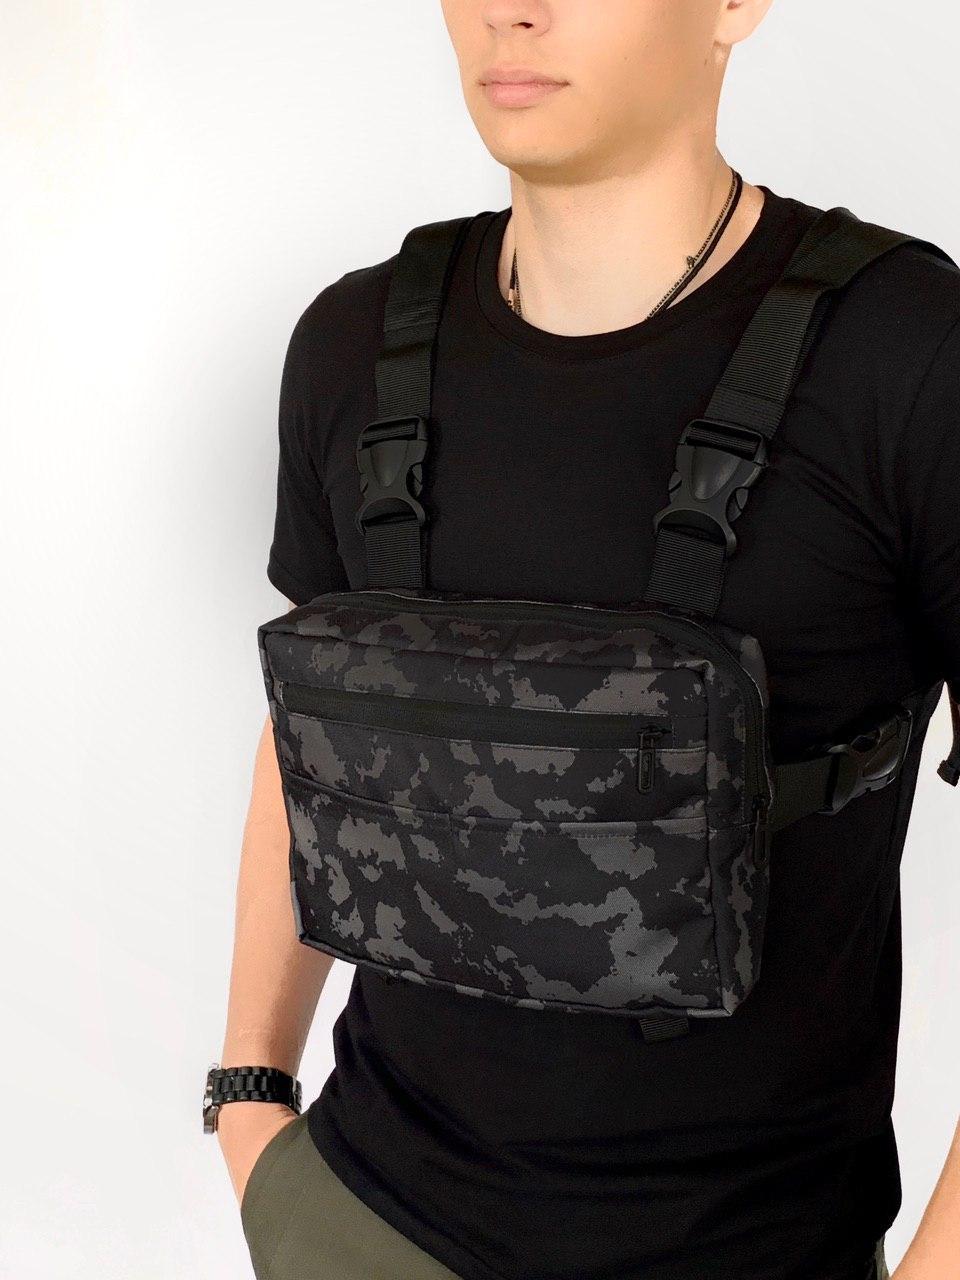 Нагрудная сумка Intruder Camouflage / Мужская Сумка барсетка камуфляж